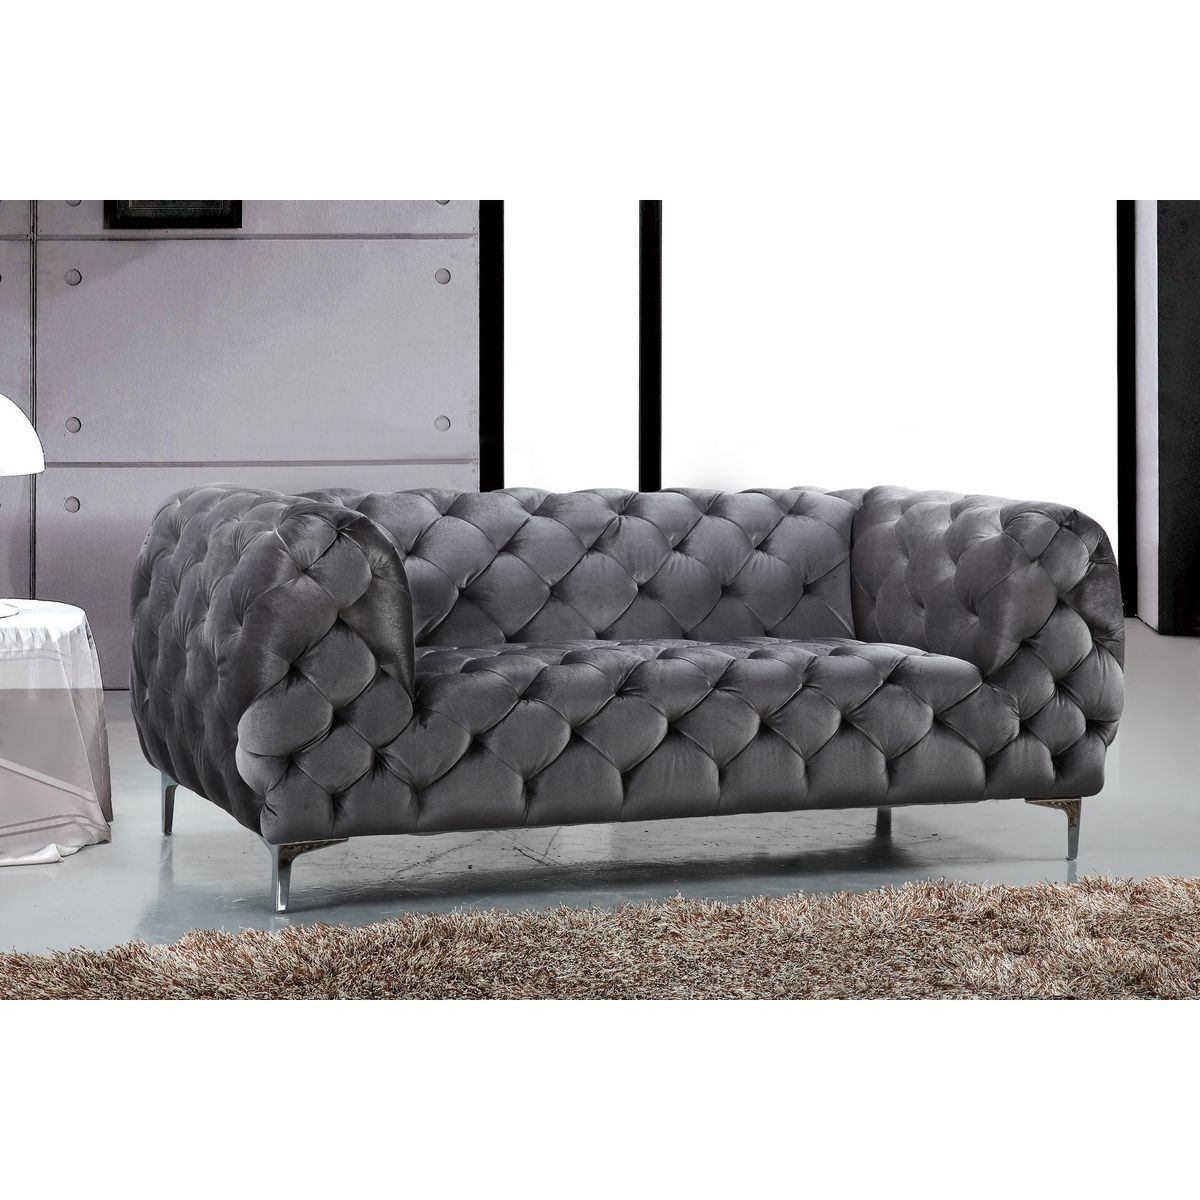 Most Current Furniture : Reclining Sofa Kijiji London Chesterfield Sofa Feet With Regard To Kijiji London Sectional Sofas (View 6 of 15)